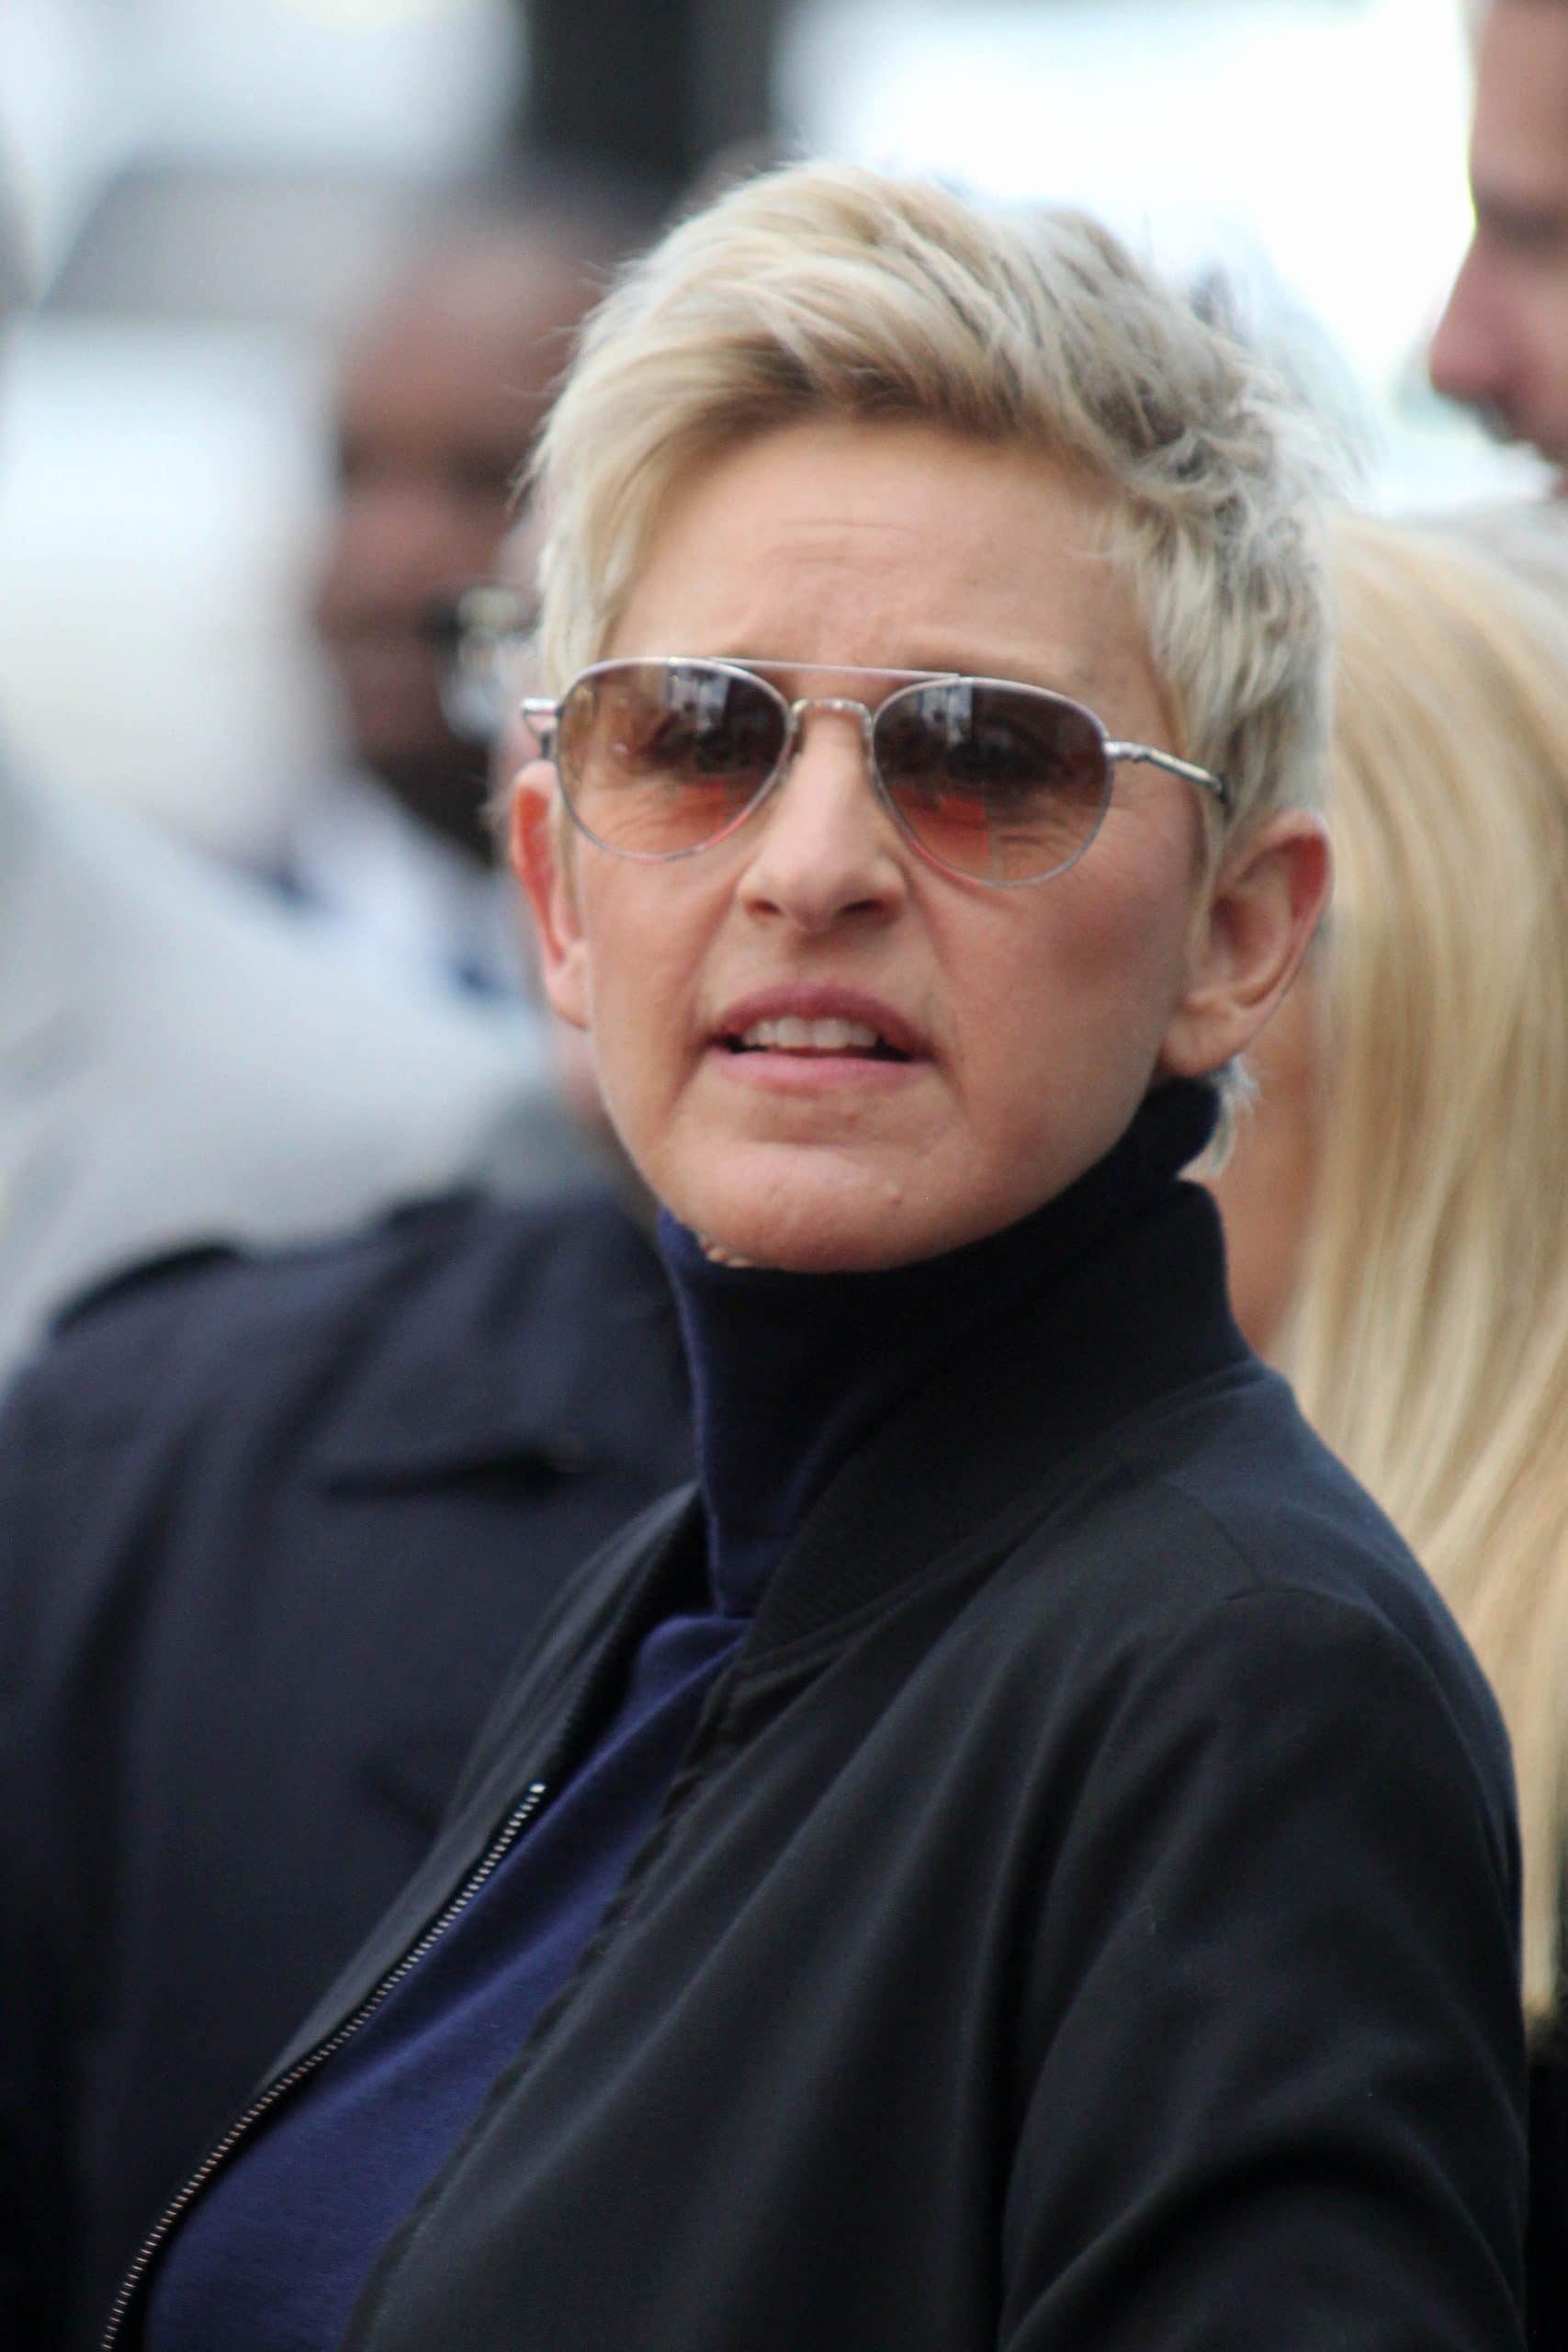 RUMOR: James Corden May Replace Ellen Degeneres Following 'Toxic Workplace' Allegations